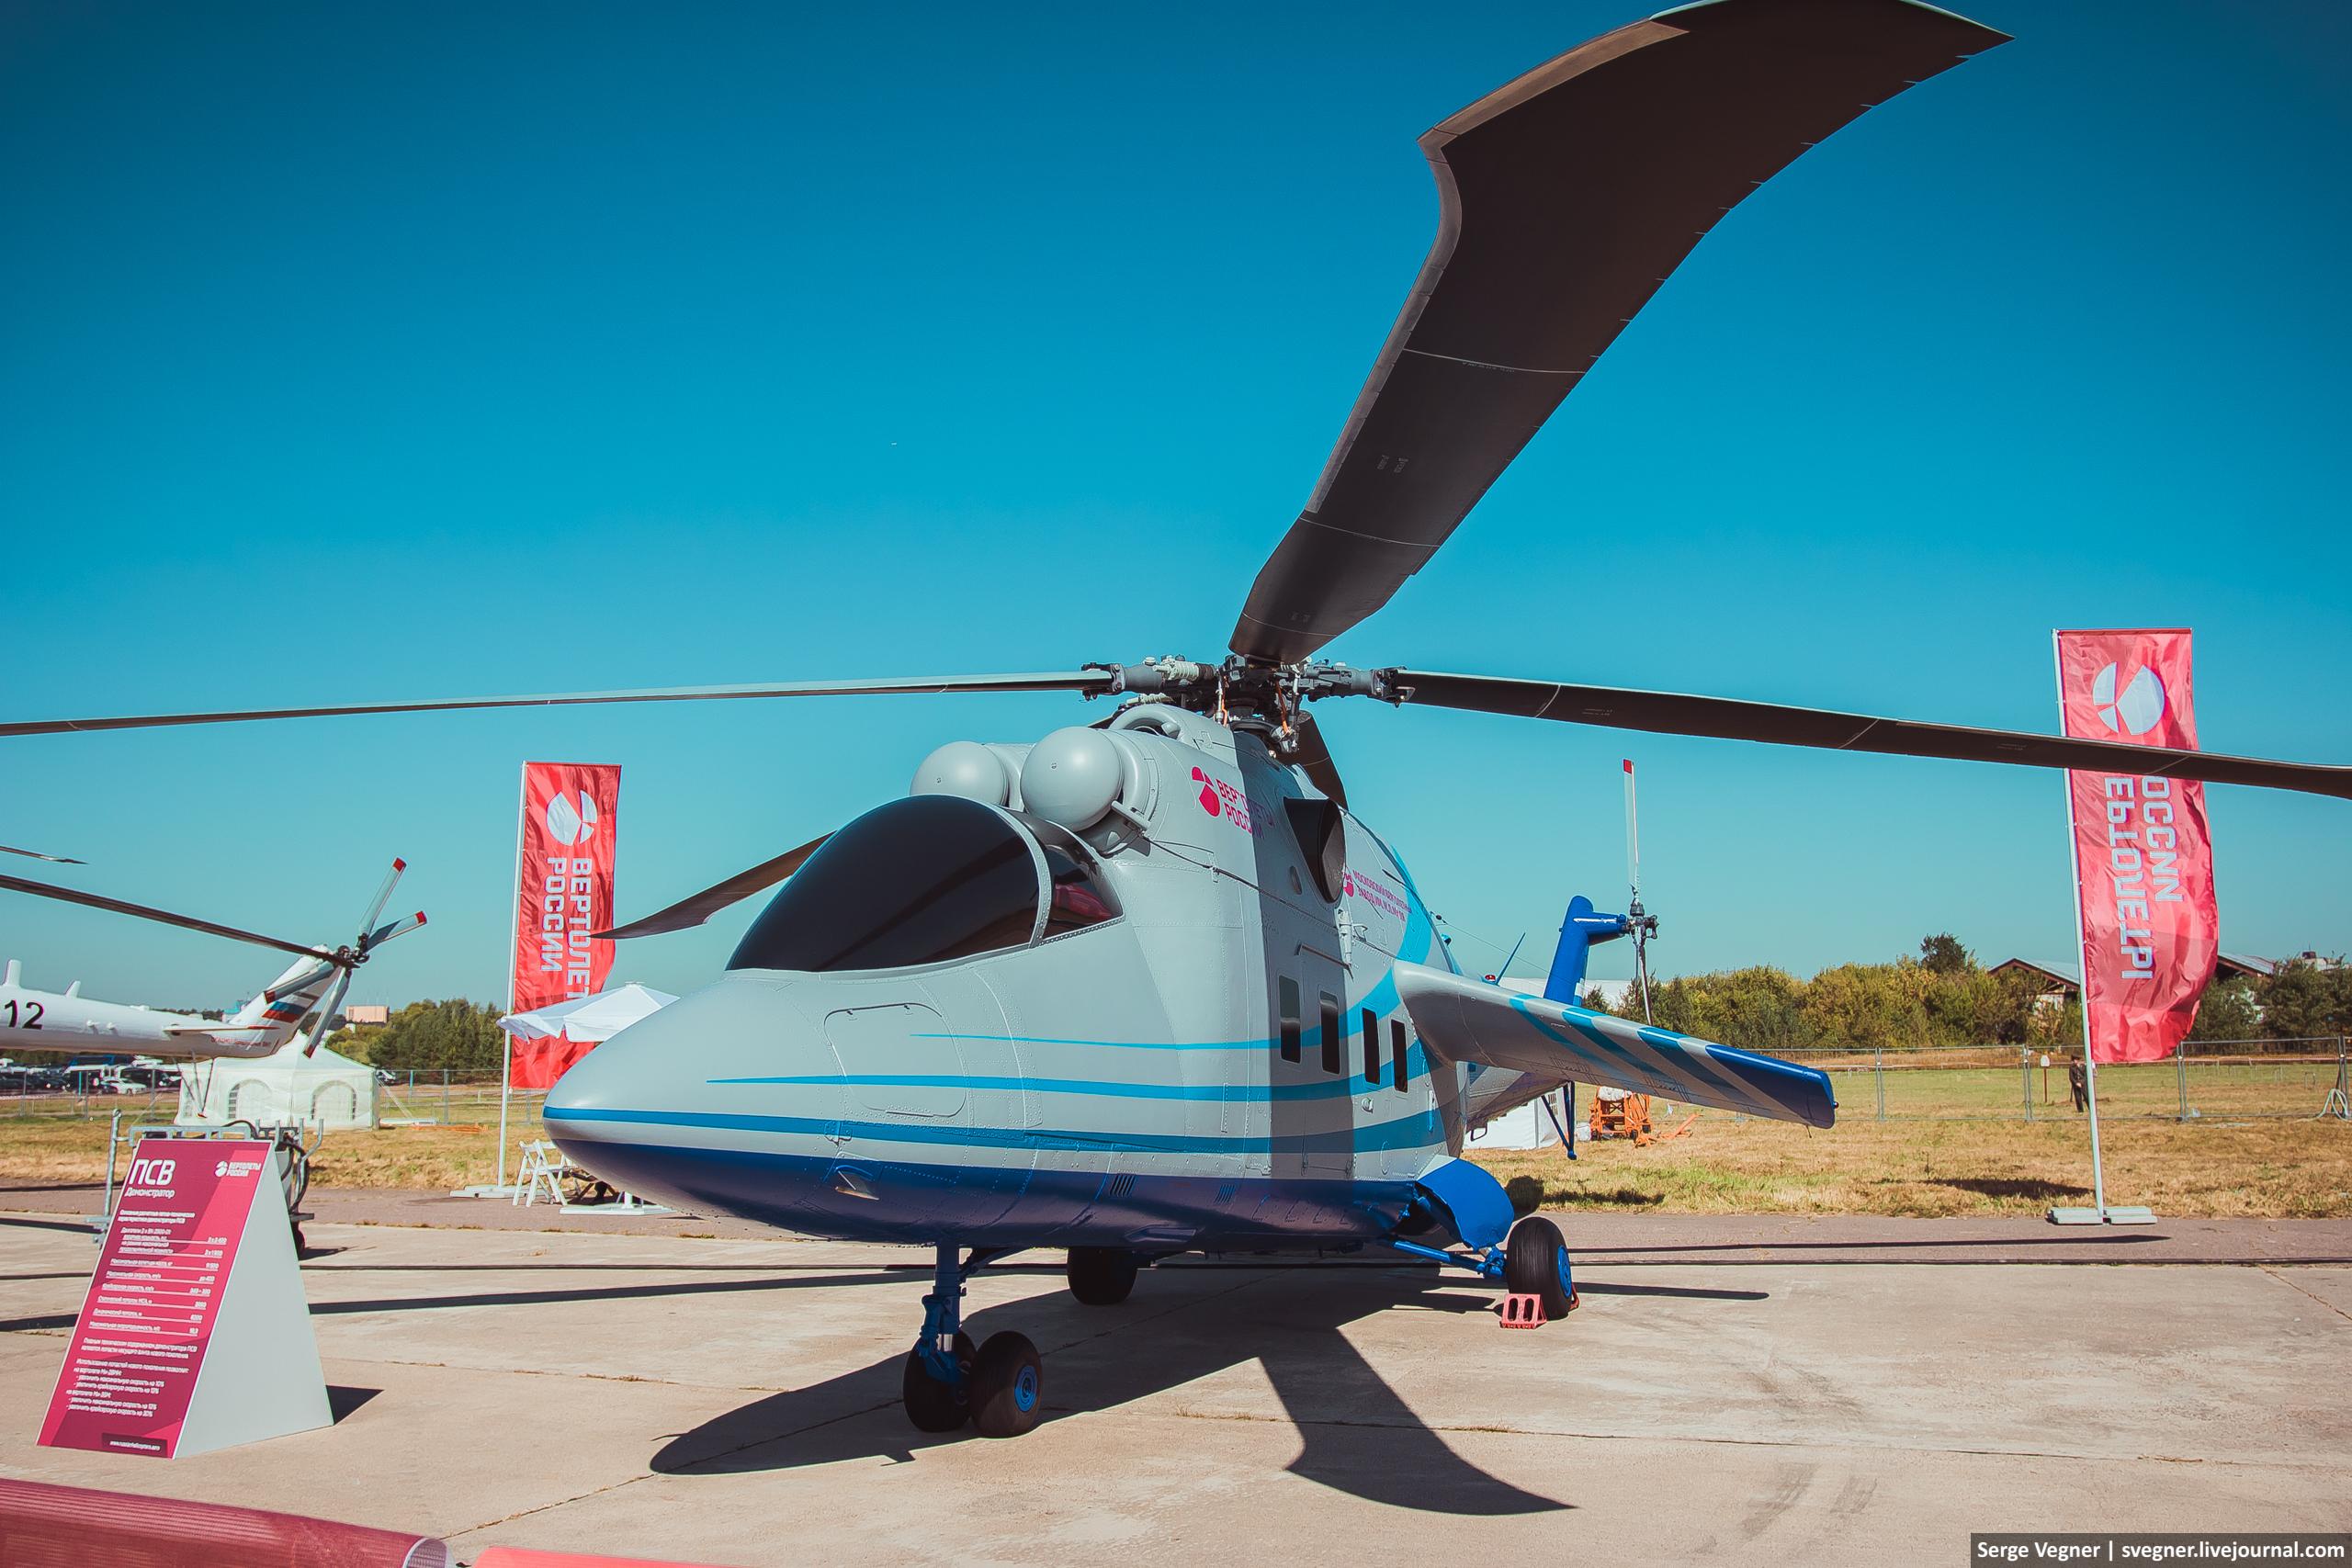 MAKS-2015 Air Show: Photos and Discussion - Page 3 0_f5b28_b43b0dbc_orig